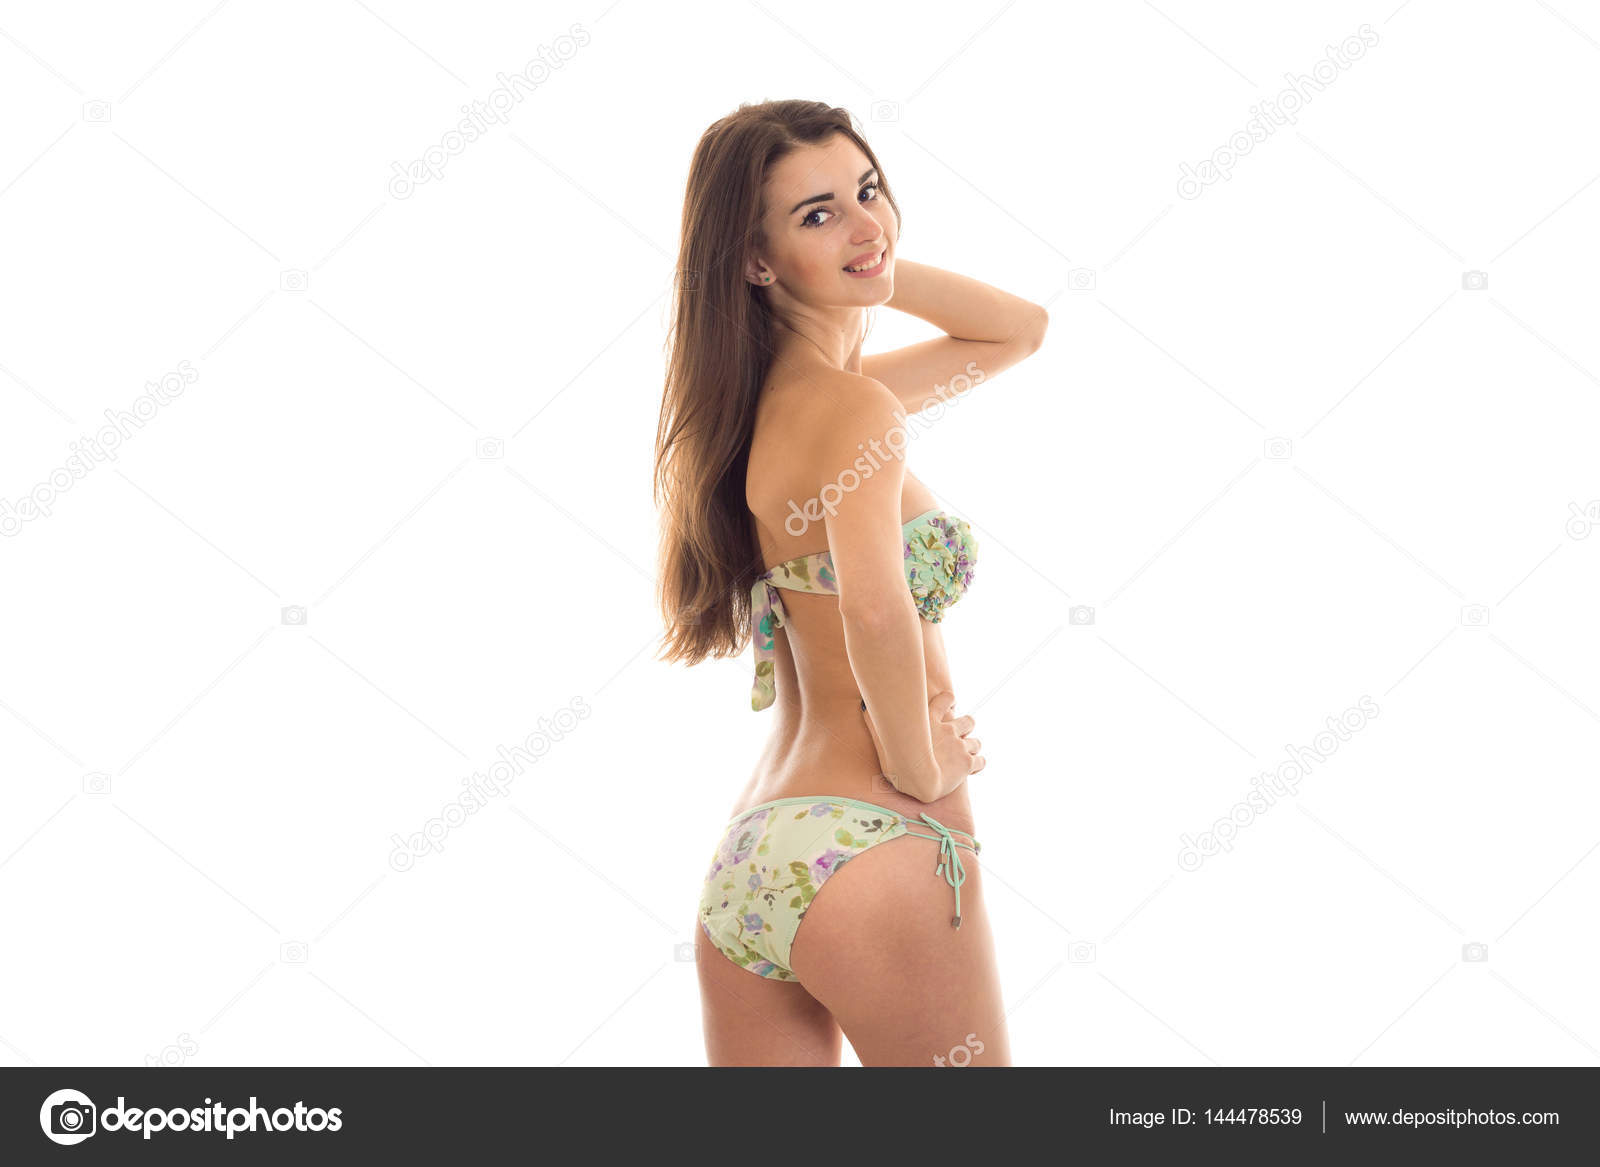 Hot Μπικίνι έφηβος σεξ